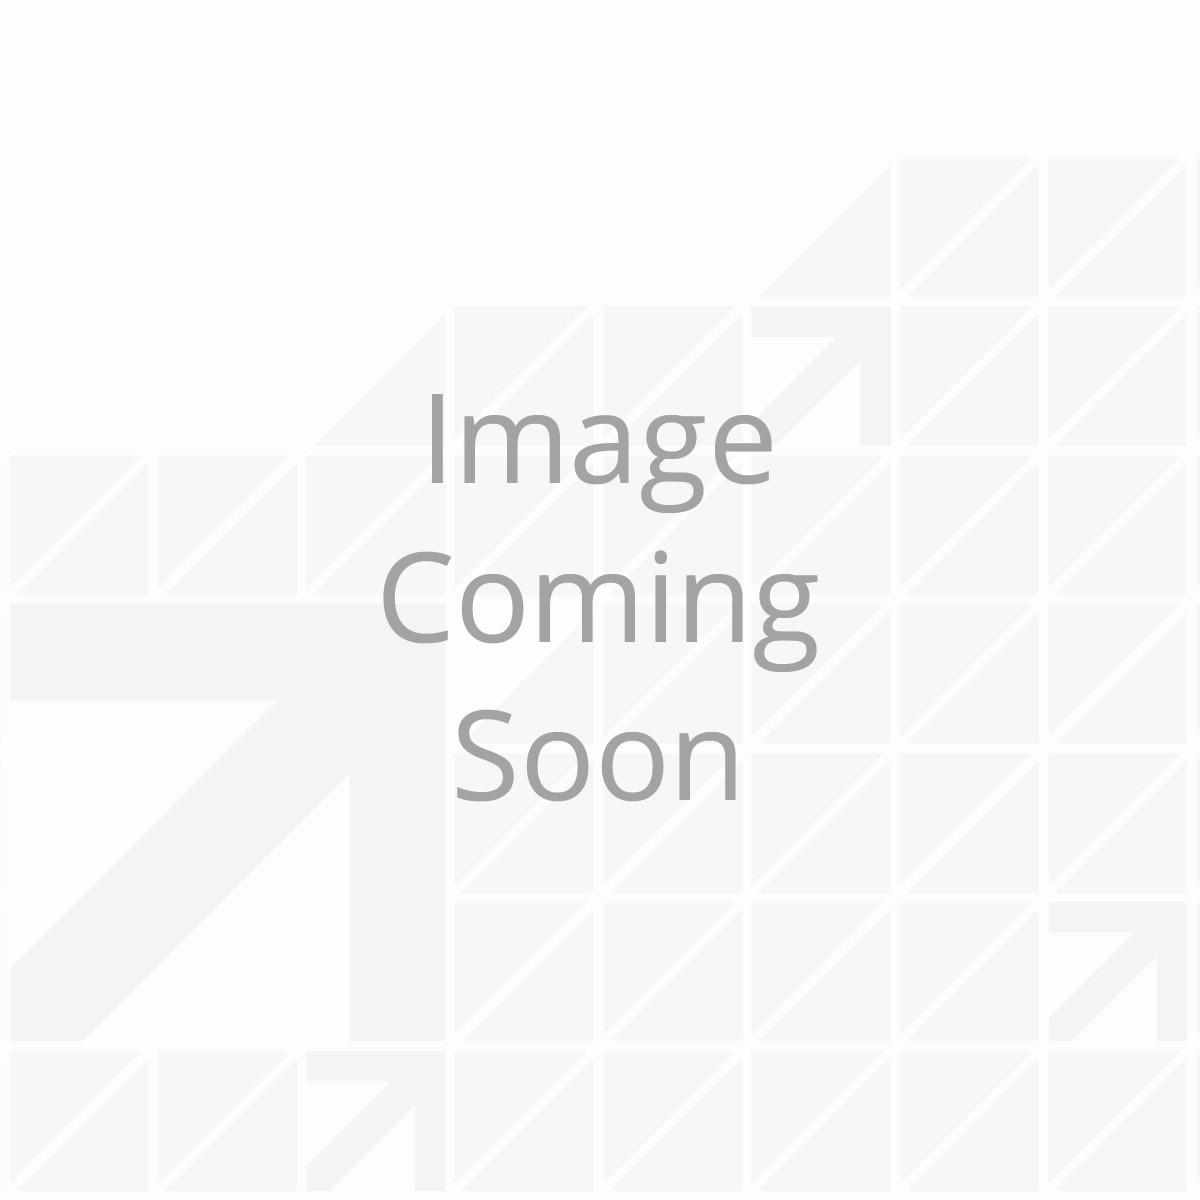 Inner Bearing Cone - 10,000 lbs. Axles